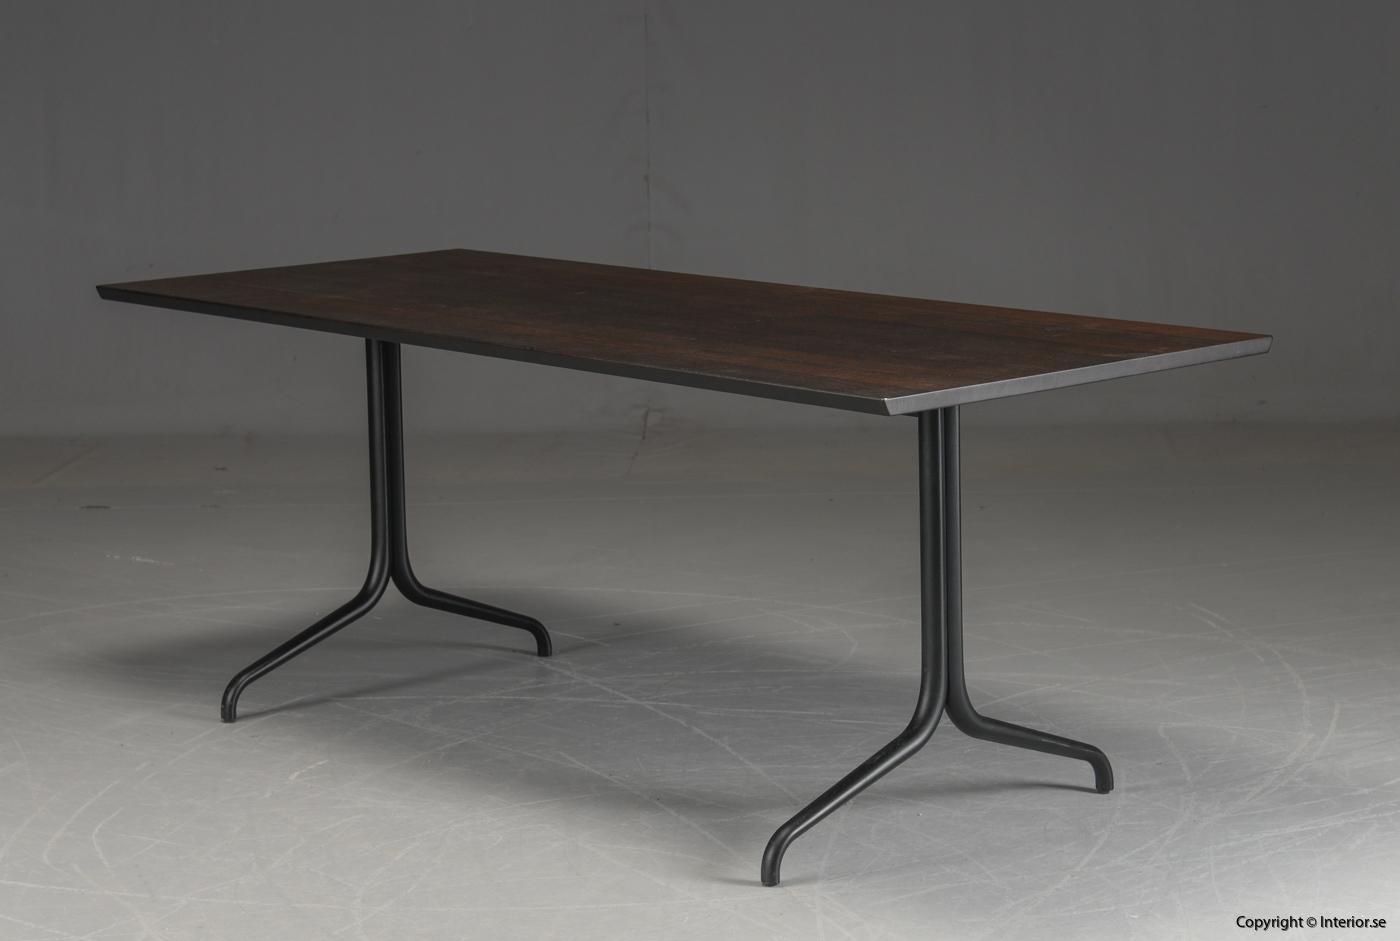 Konferensbord, Vitra Belleville Table - Ronan & Erwan Bouroullec 4